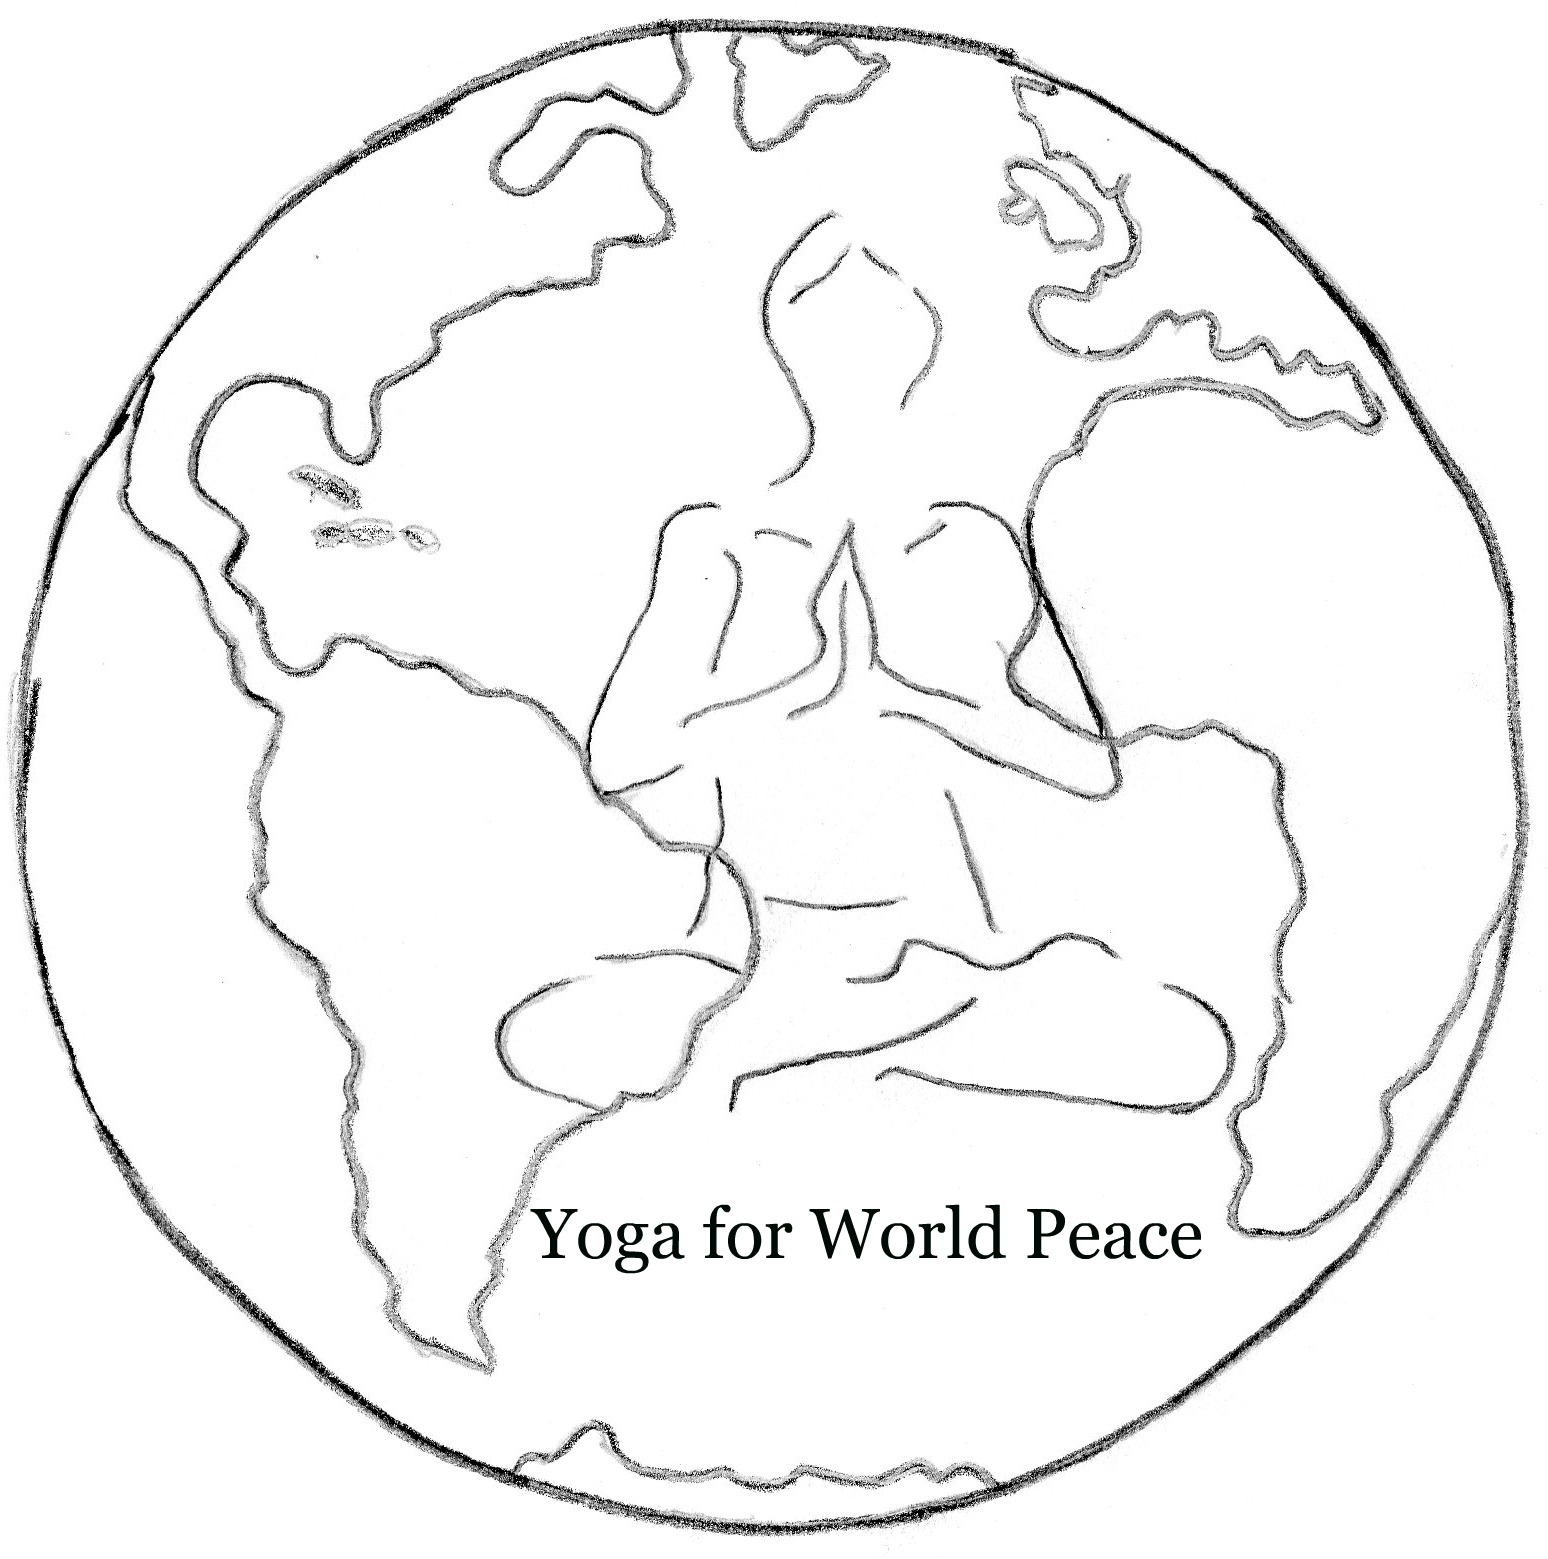 1548x1559 Yoga For World Peace Yoga For World Peace